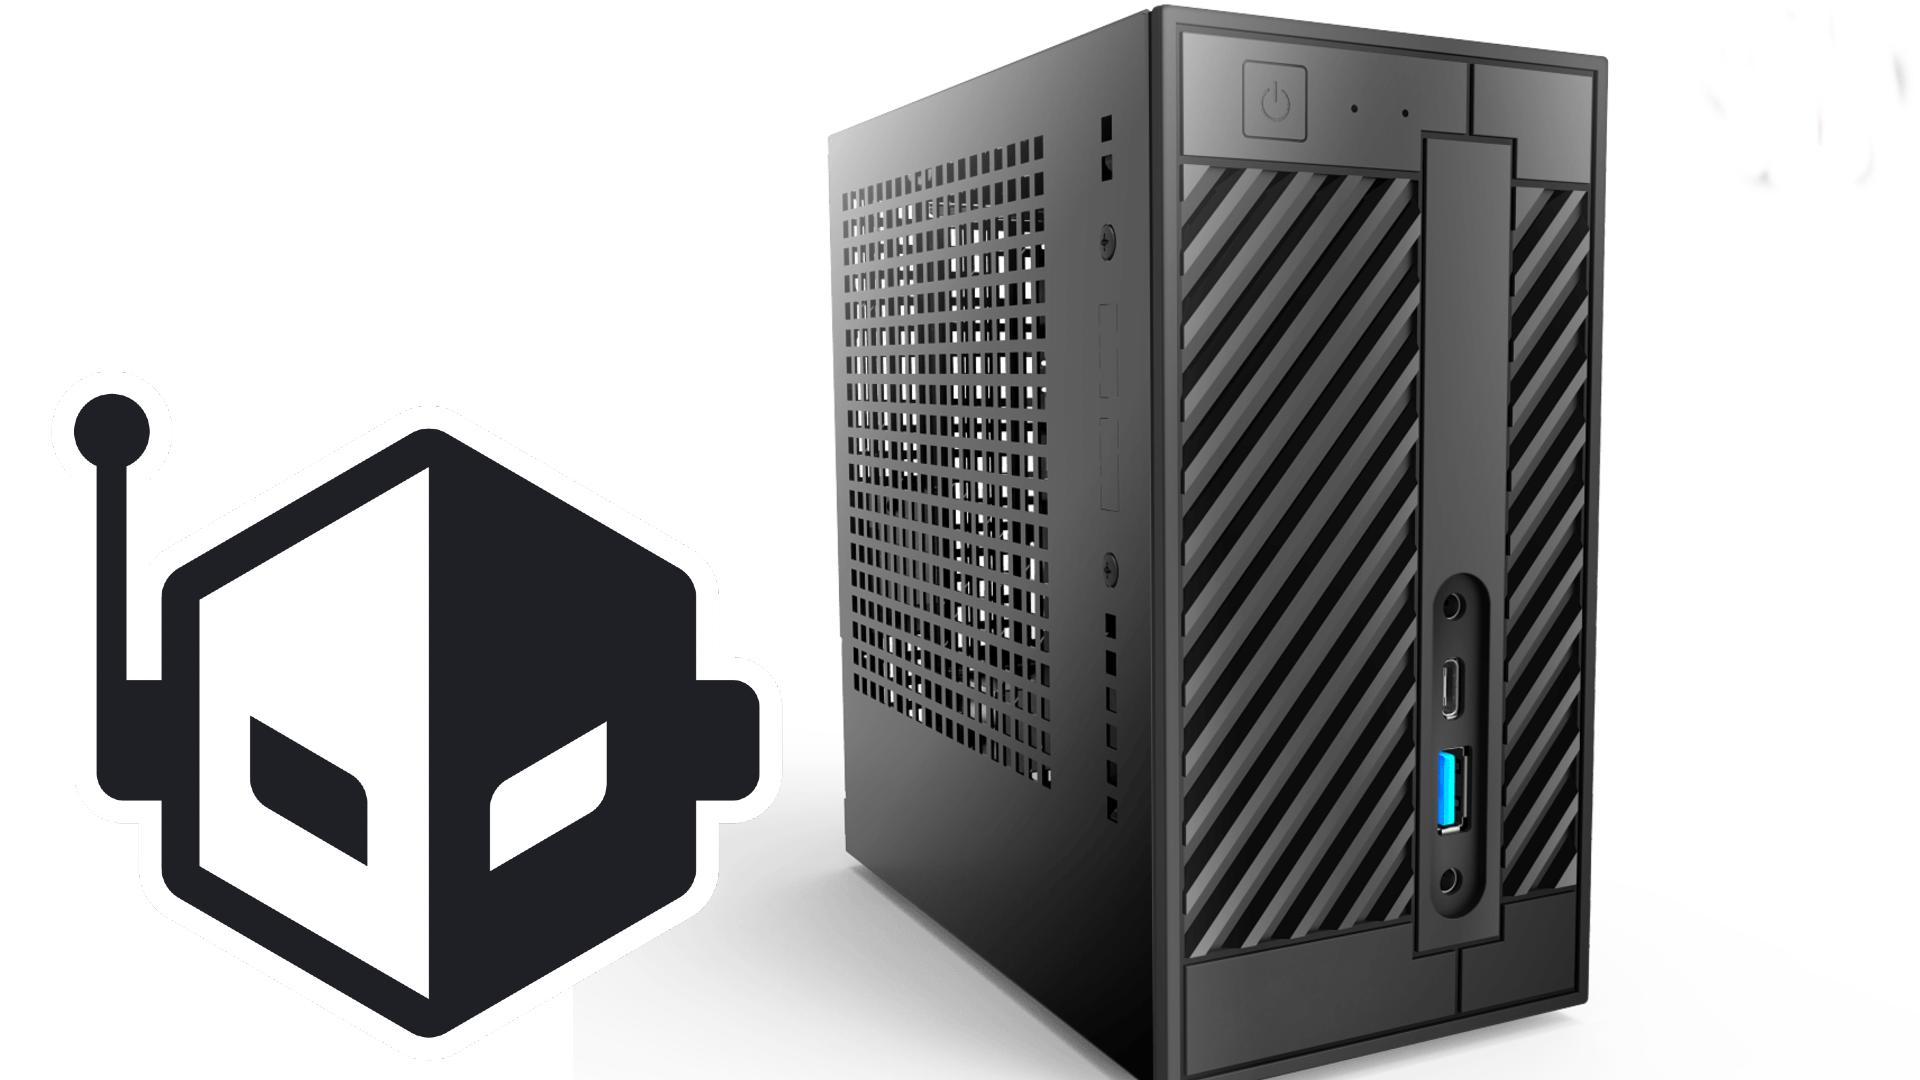 ASRock Announced The DeskMini Max Concept PC, Featuring a Compact 10L Size